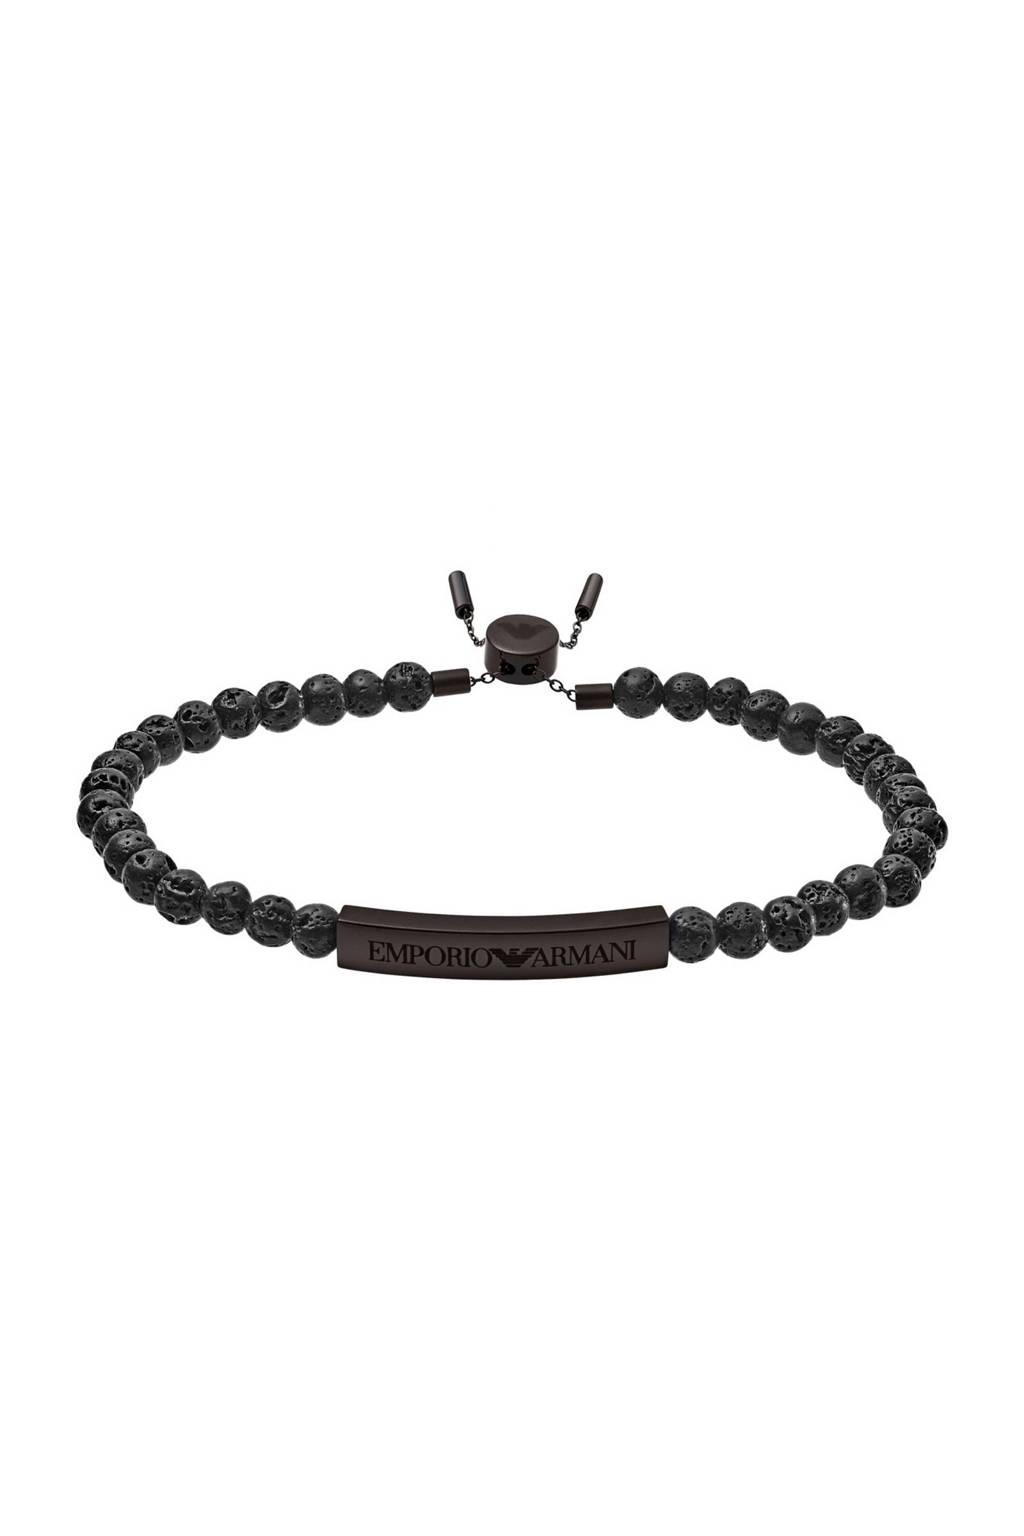 Emporio Armani Refined Rawness armband EGS2478001, Zwart